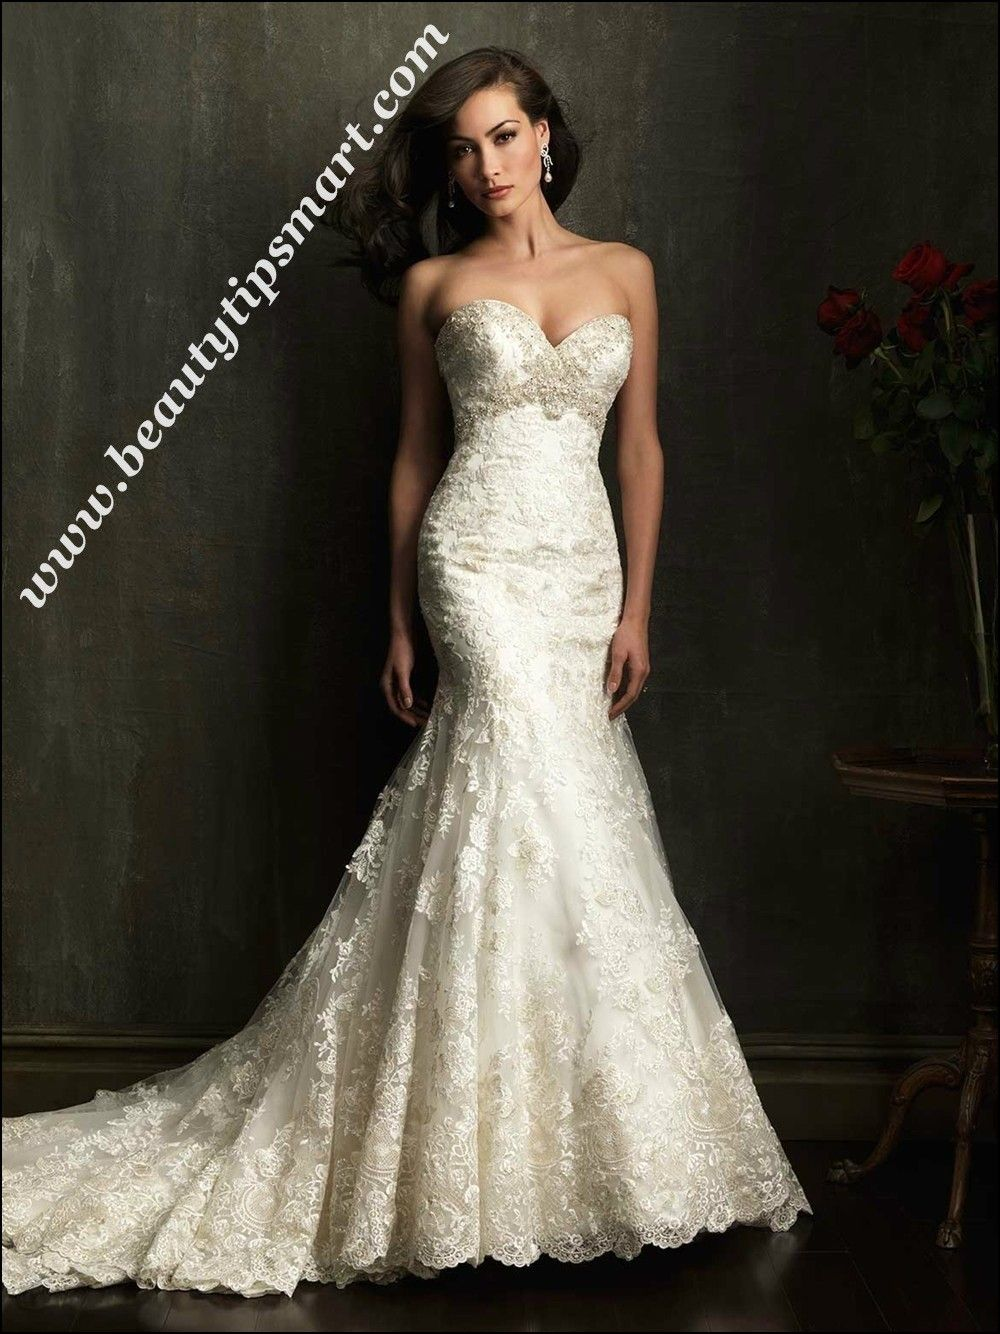 Fantastic Renee Strauss Wedding Gowns Pattern - Best Evening Gown ...